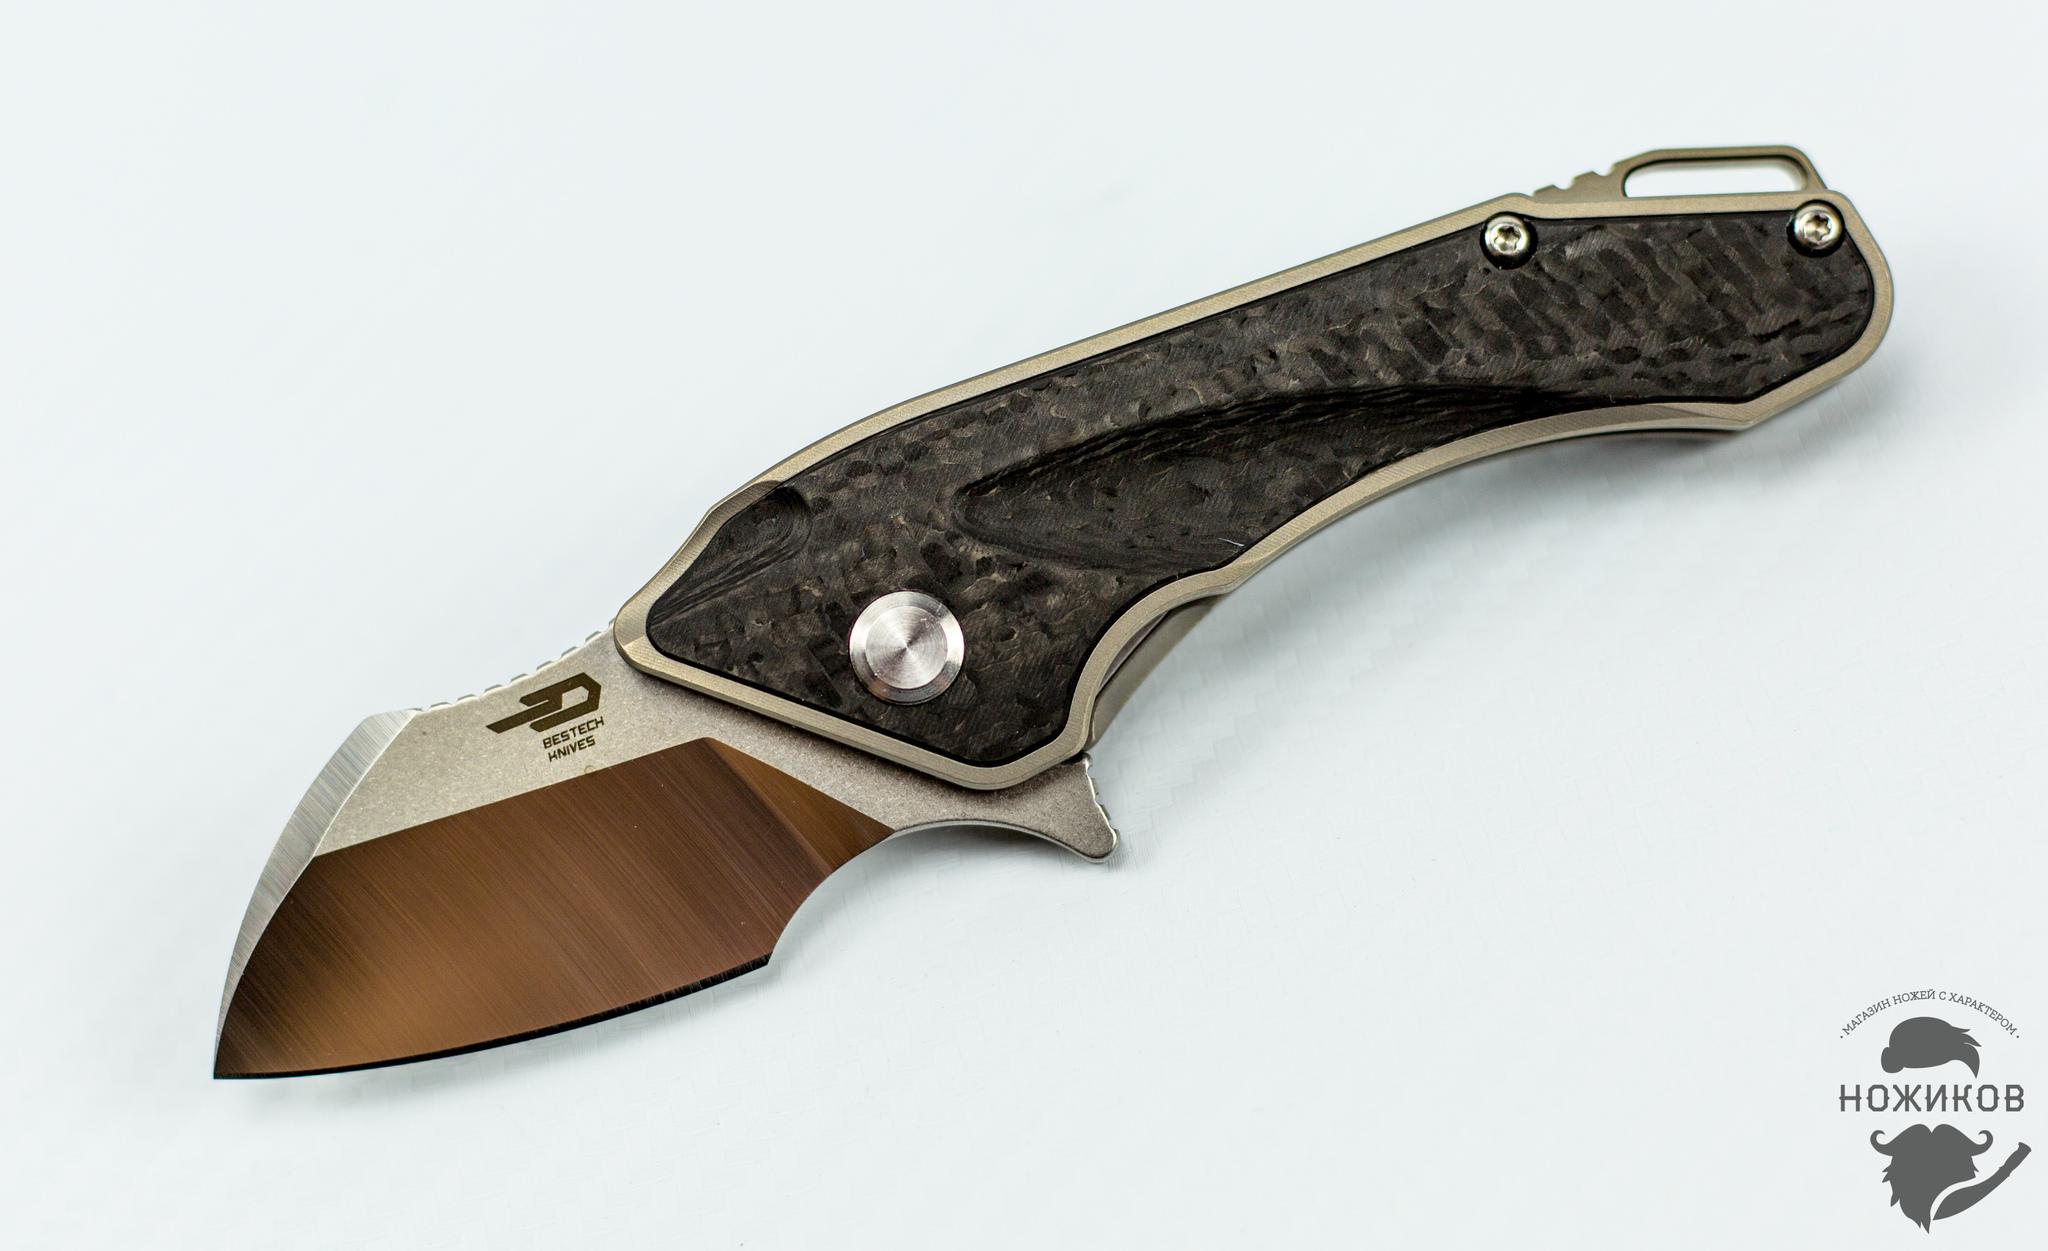 Фото 6 - Складной нож Bestech IMP BT1710A, сталь CPM-S35VN, рукоять титан от Bestech Knives